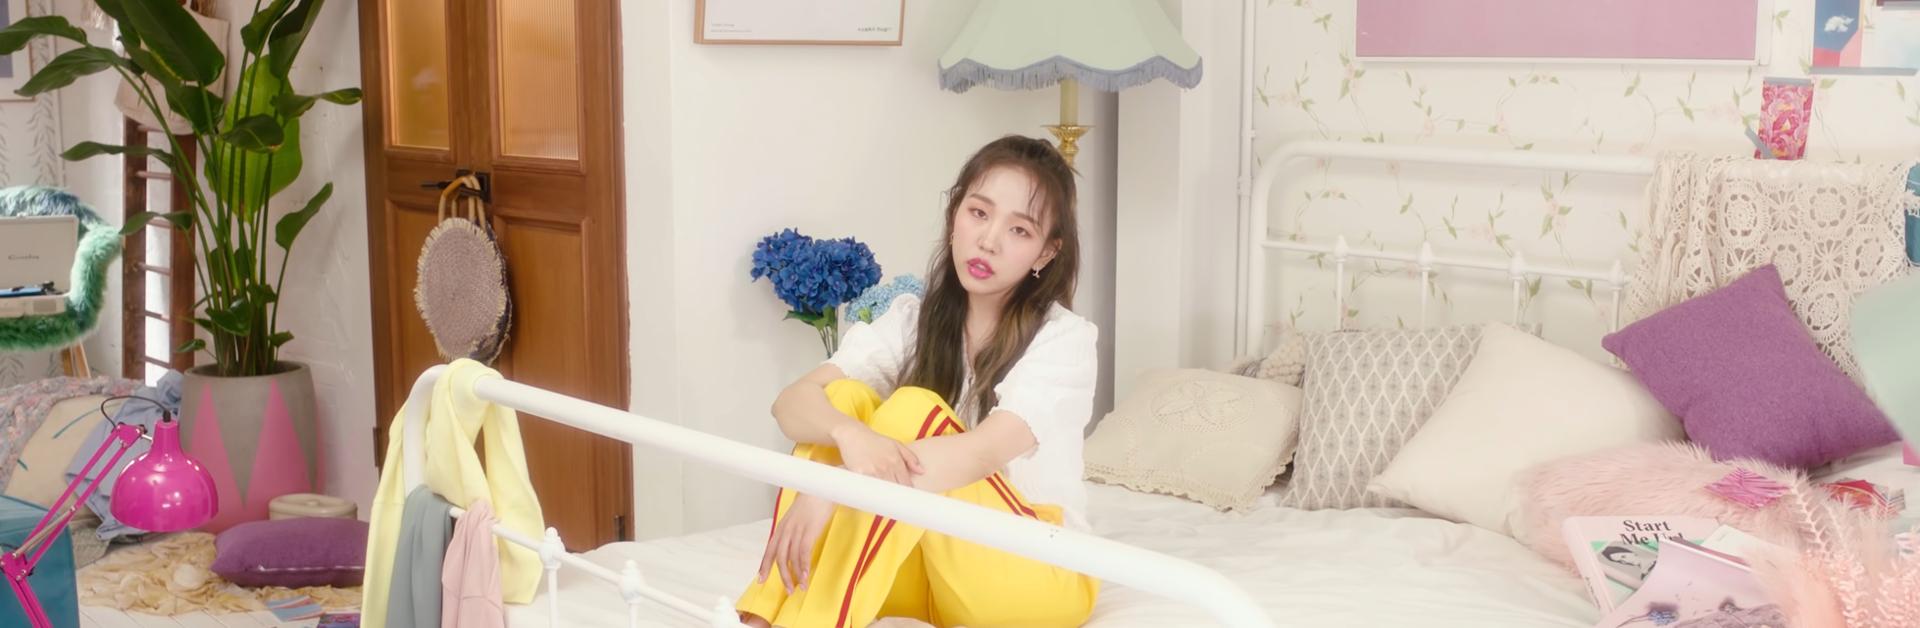 "Baek A Yeon ""Looking For Love"" MV"